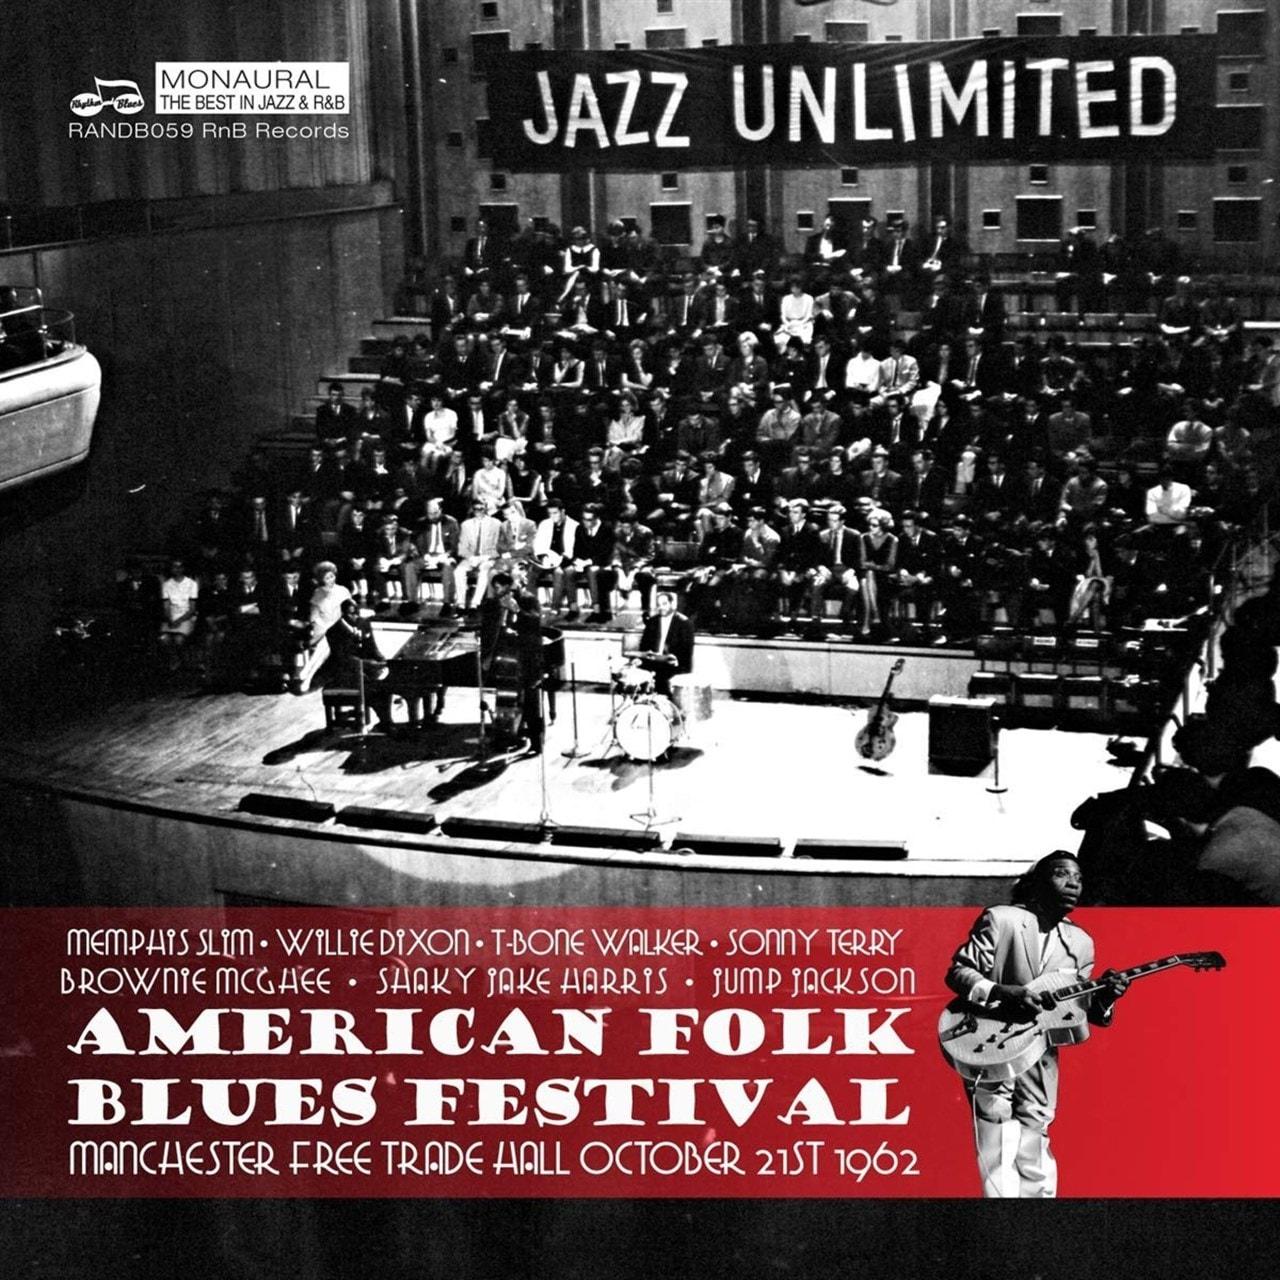 American Folk Blues Festival: Live in Manchester 1962 - 1